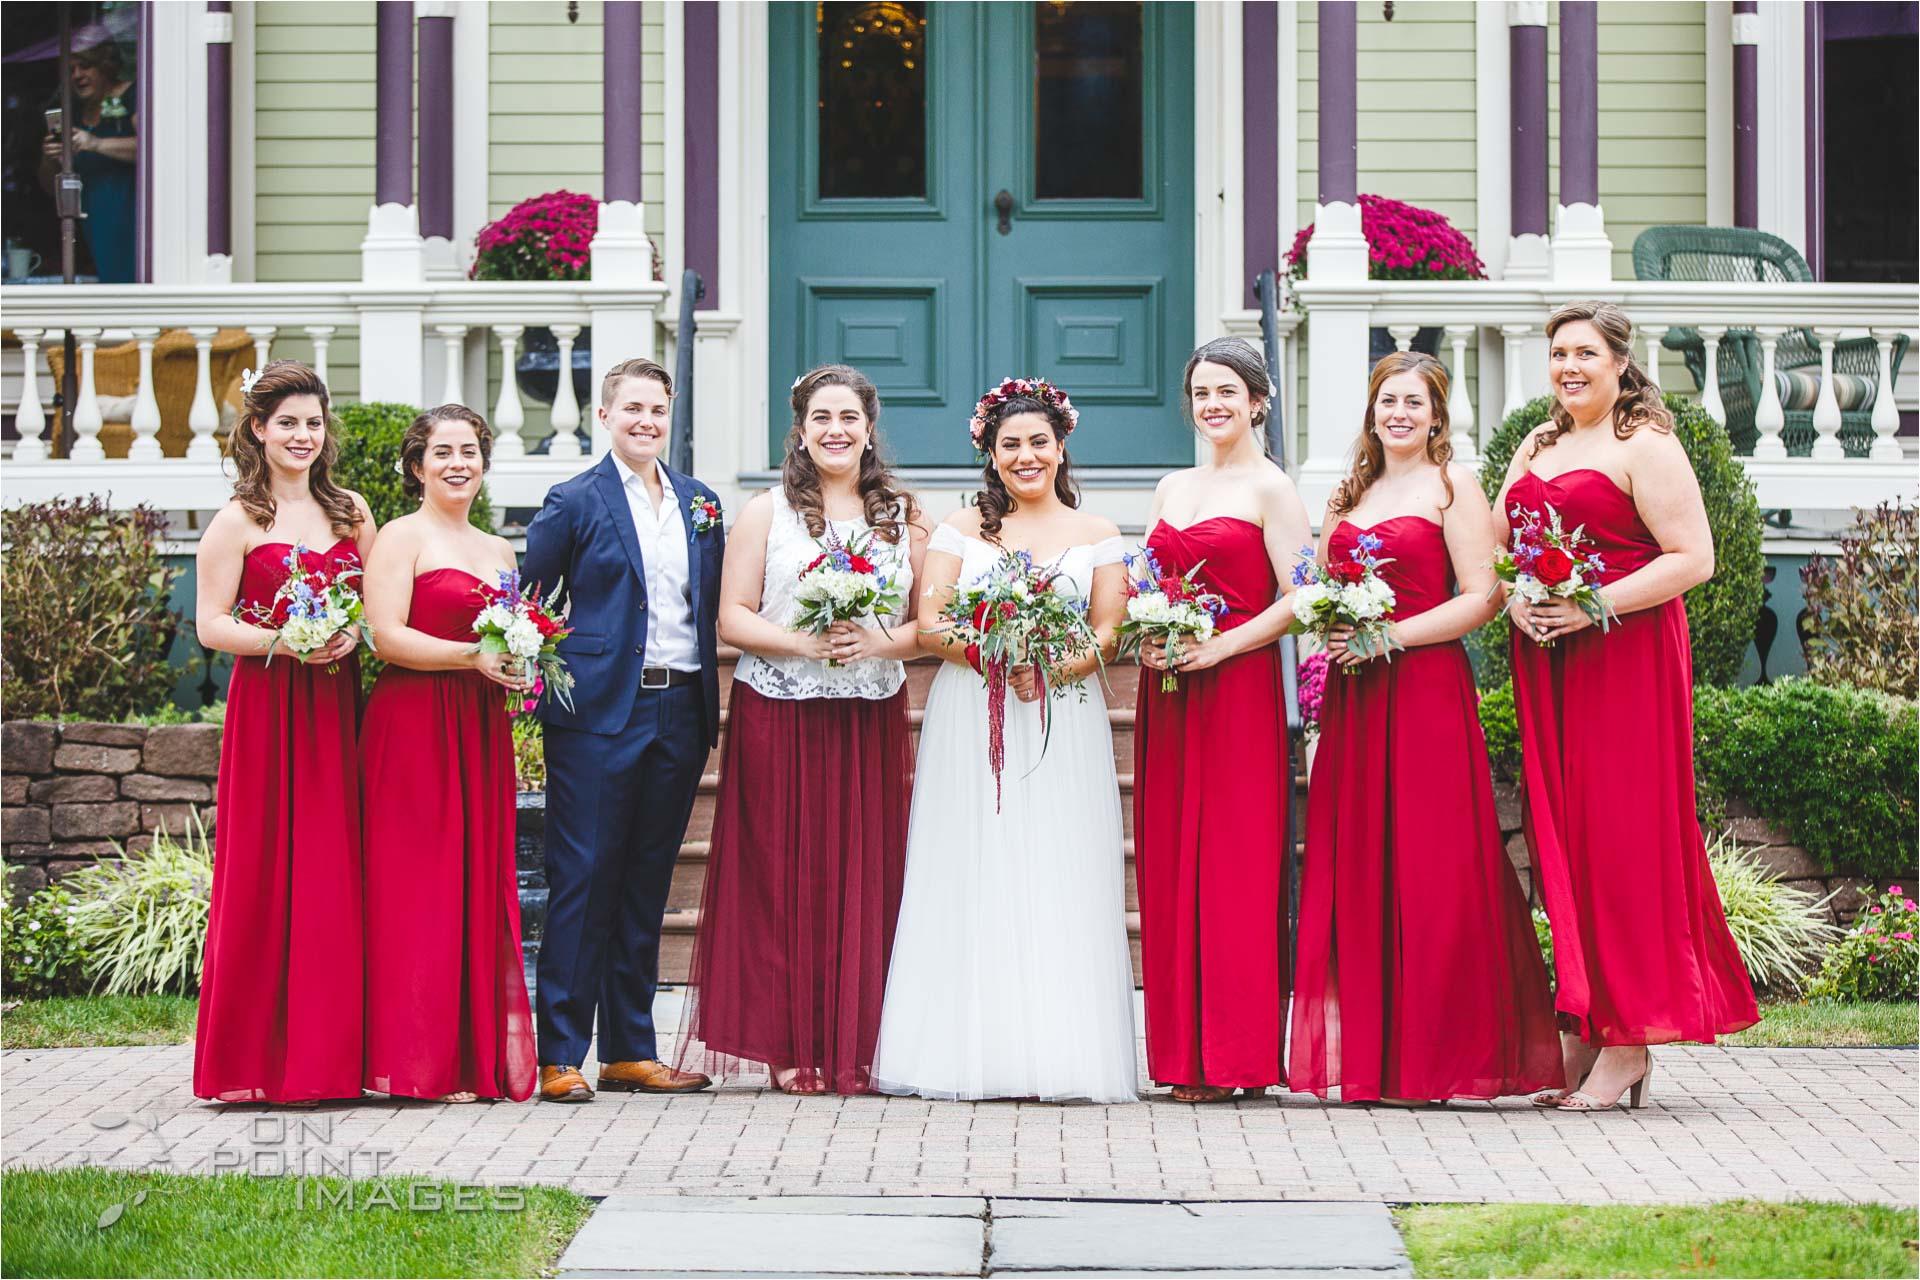 webb-barn-wedding-photography-silas-robbins-house-07.jpg